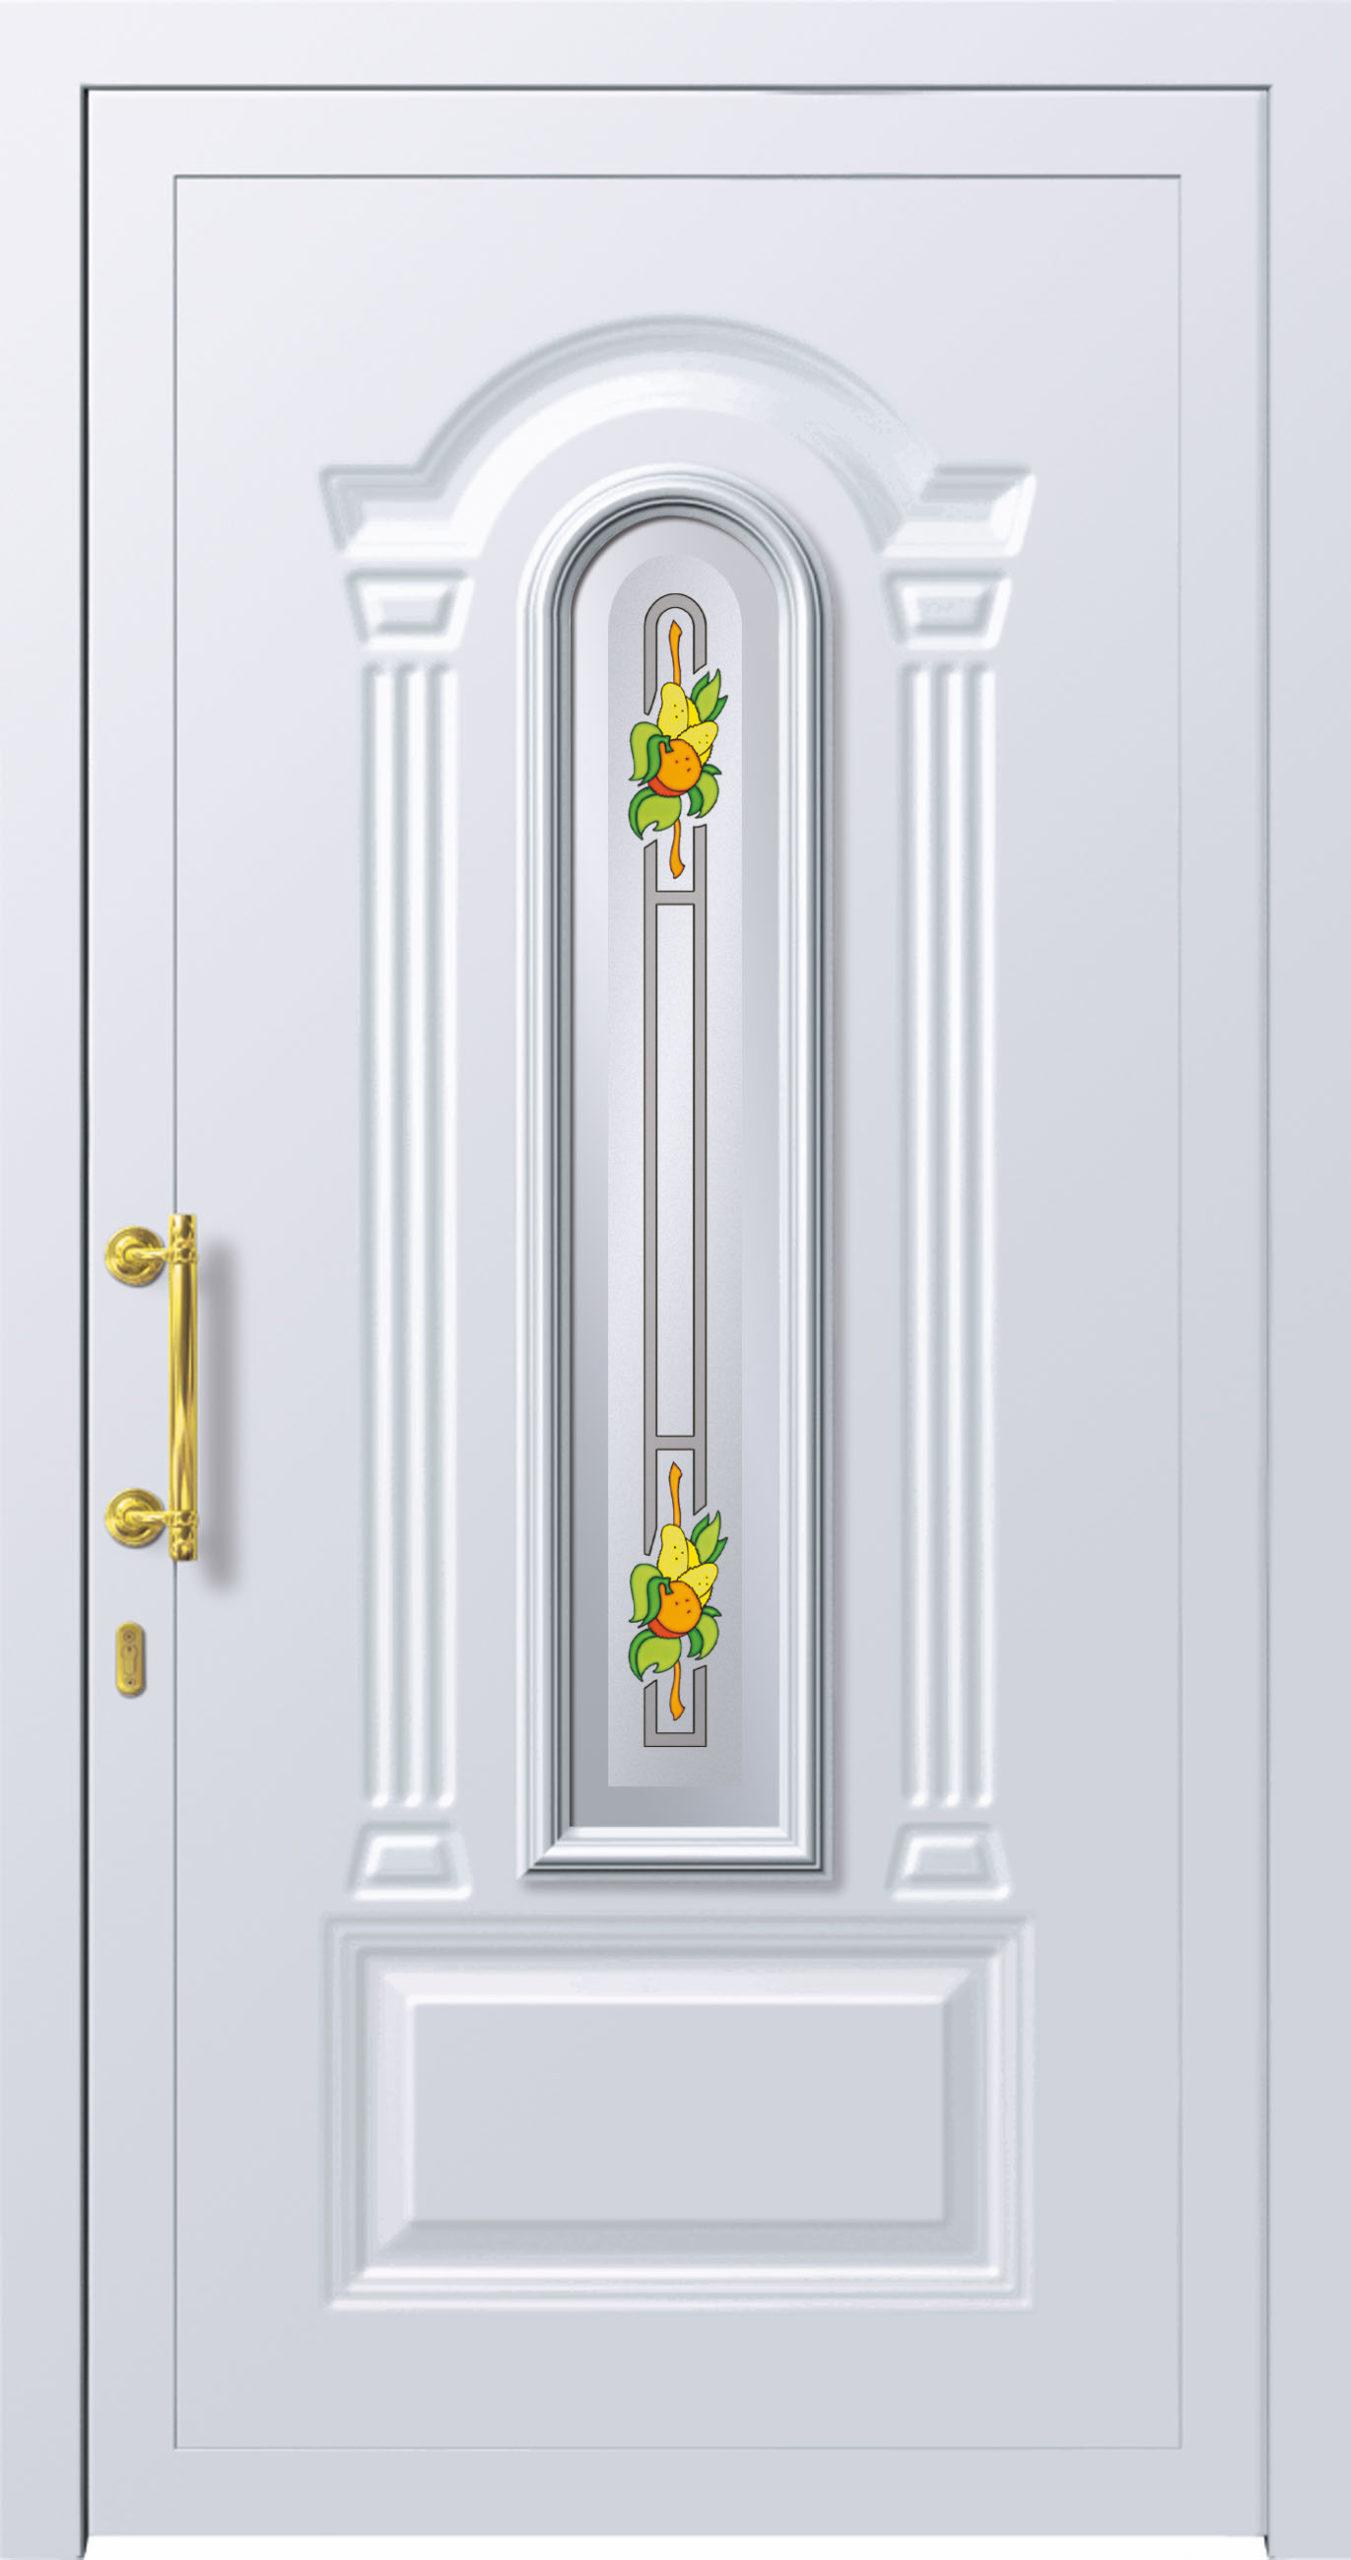 Entry Doors Linea Classica 51